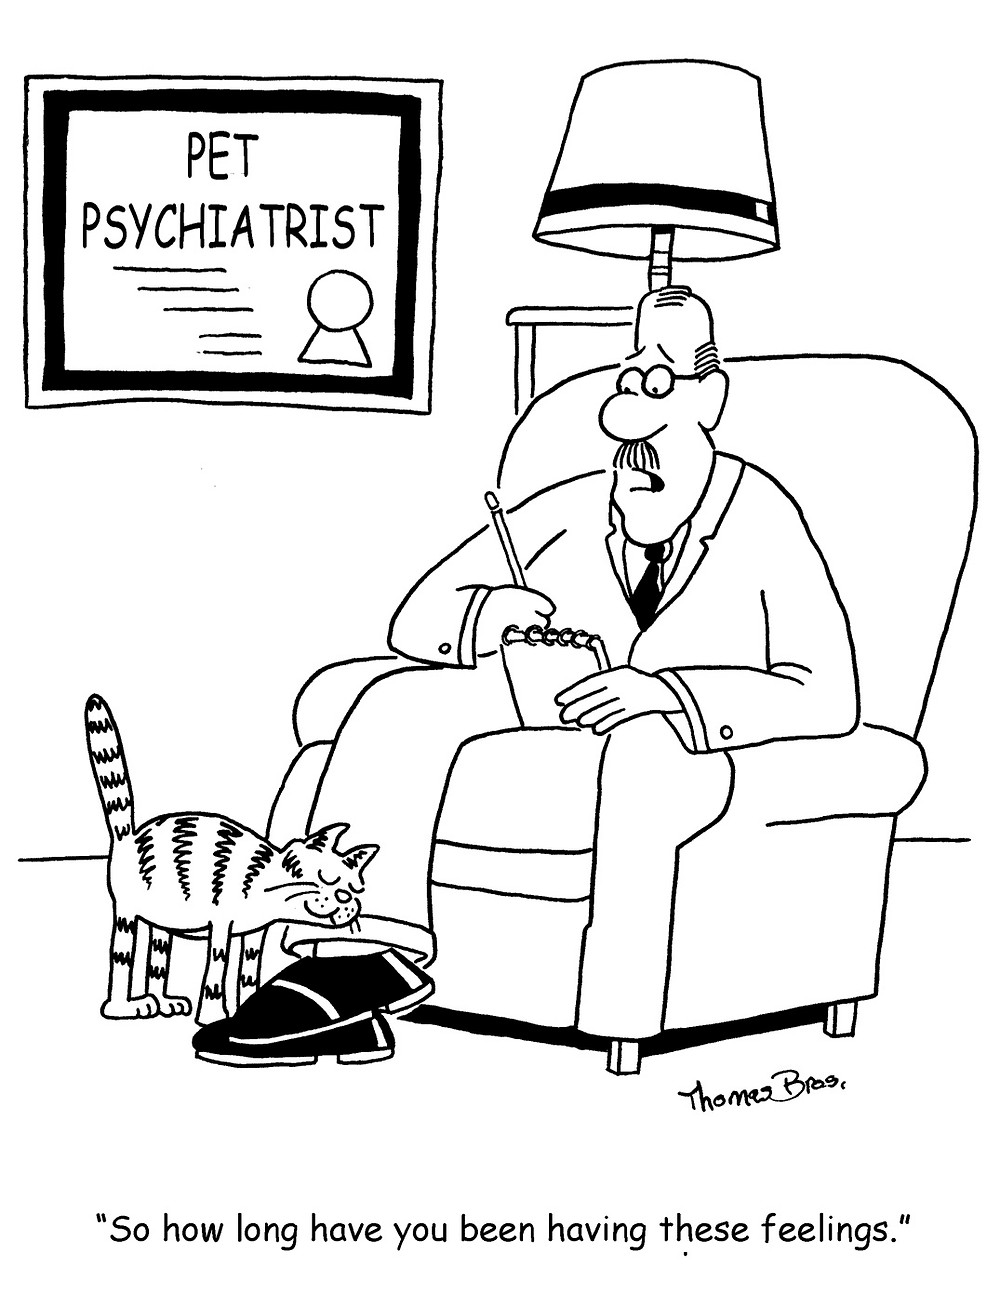 Pet Psychiatrist